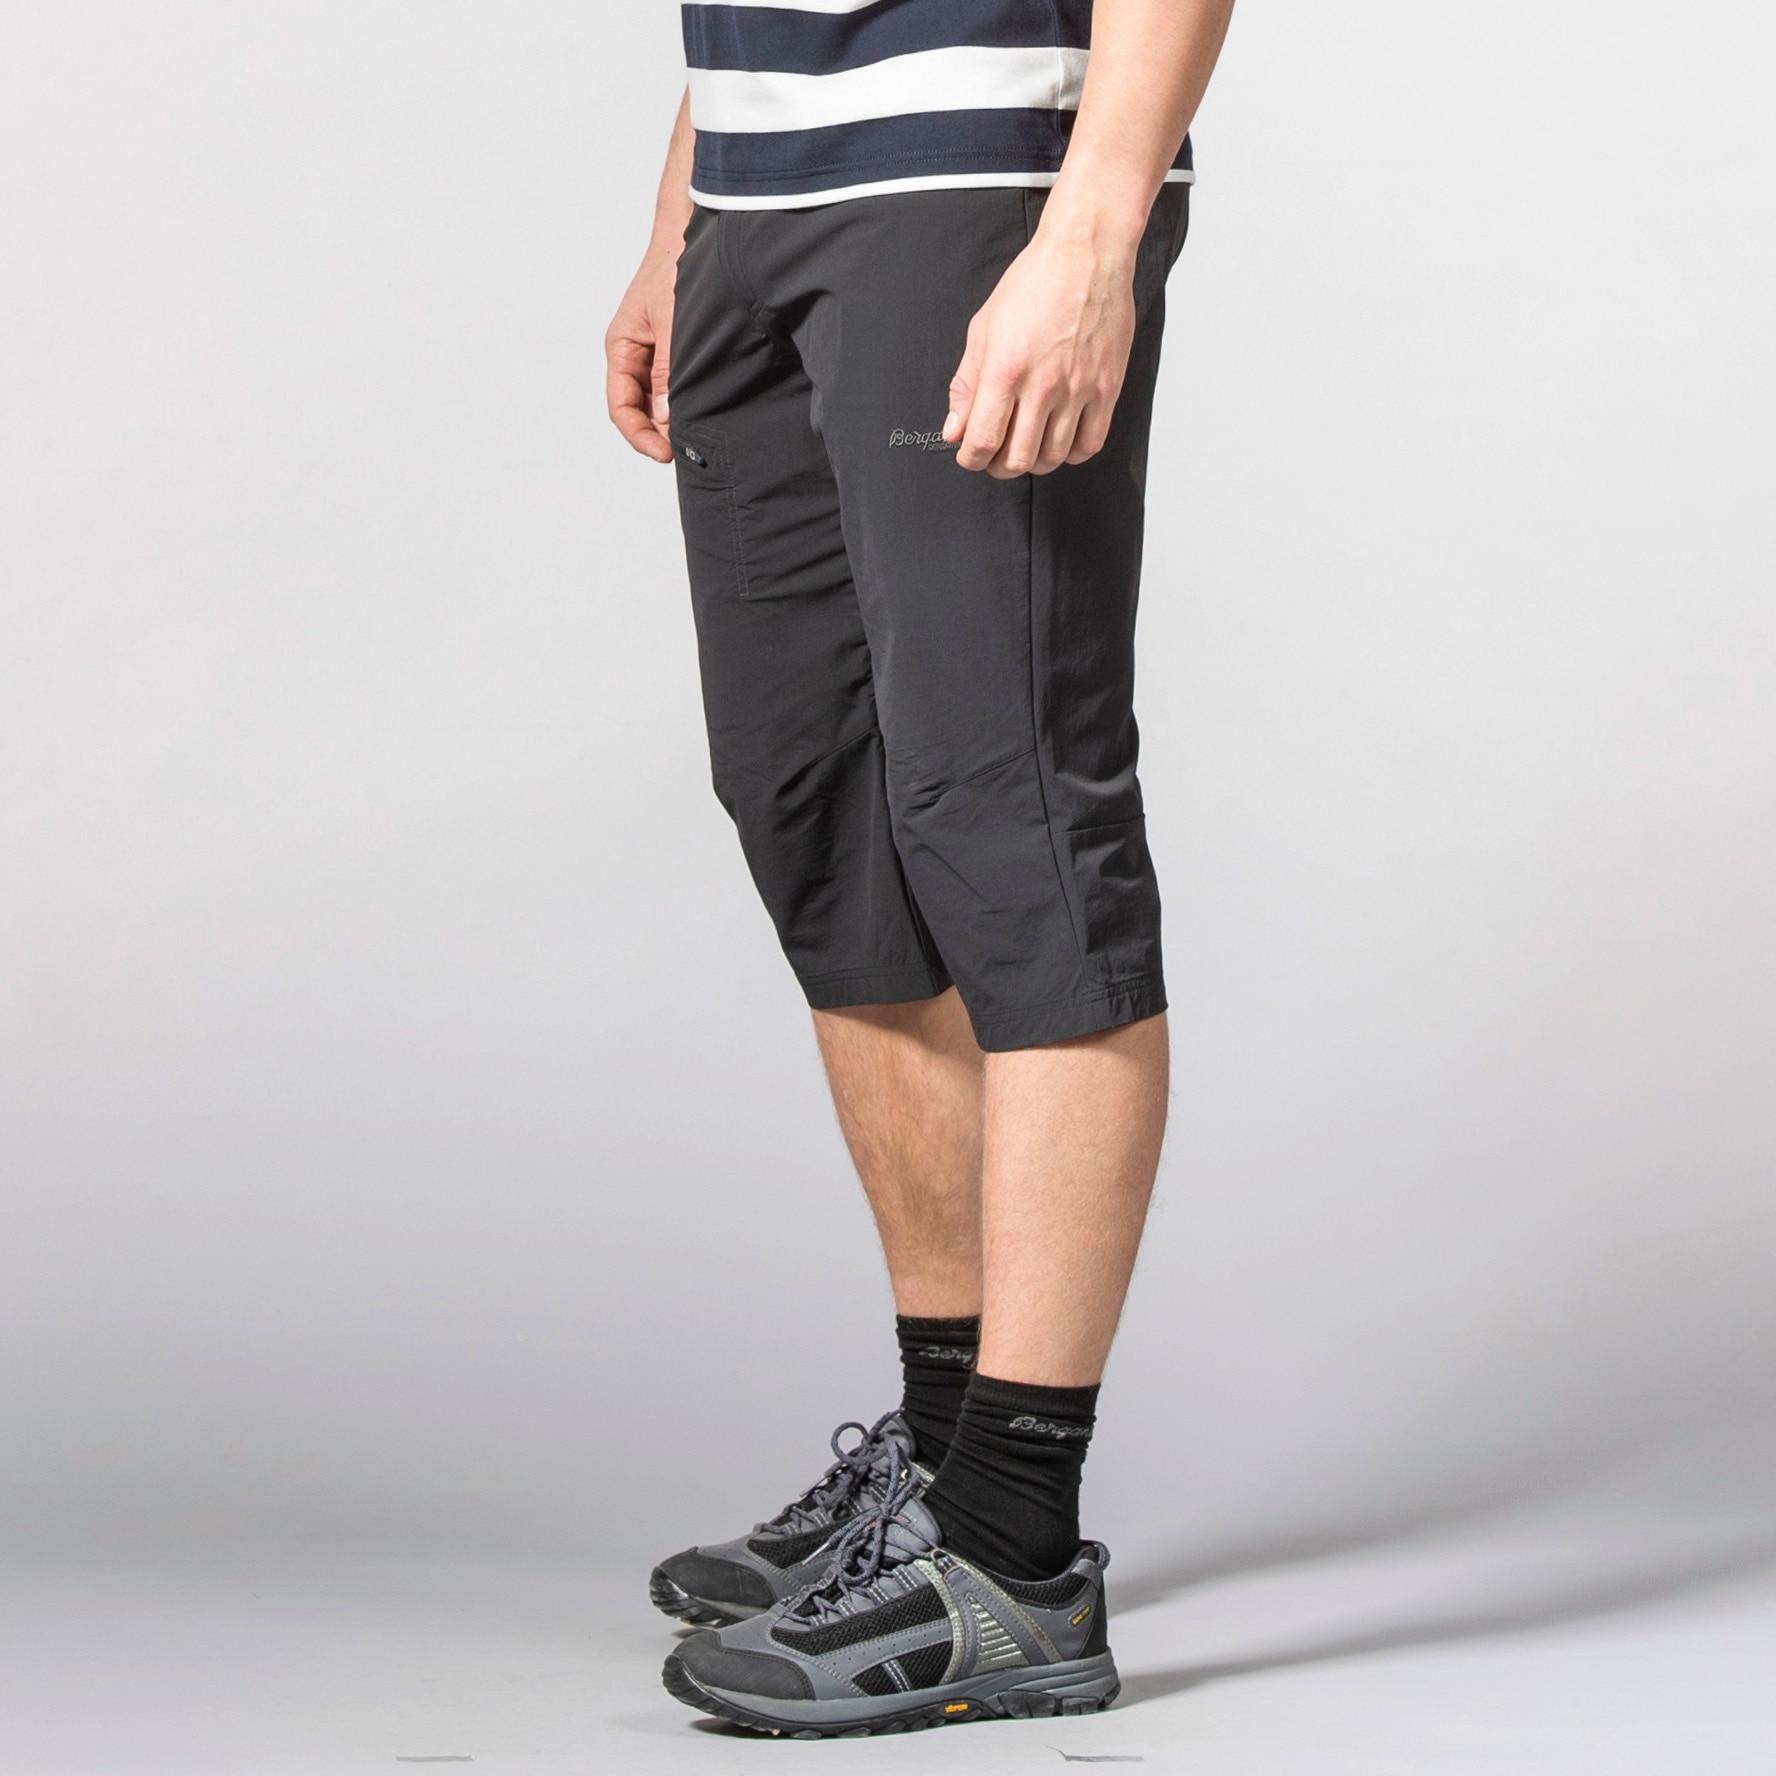 Moa Pirate Pants